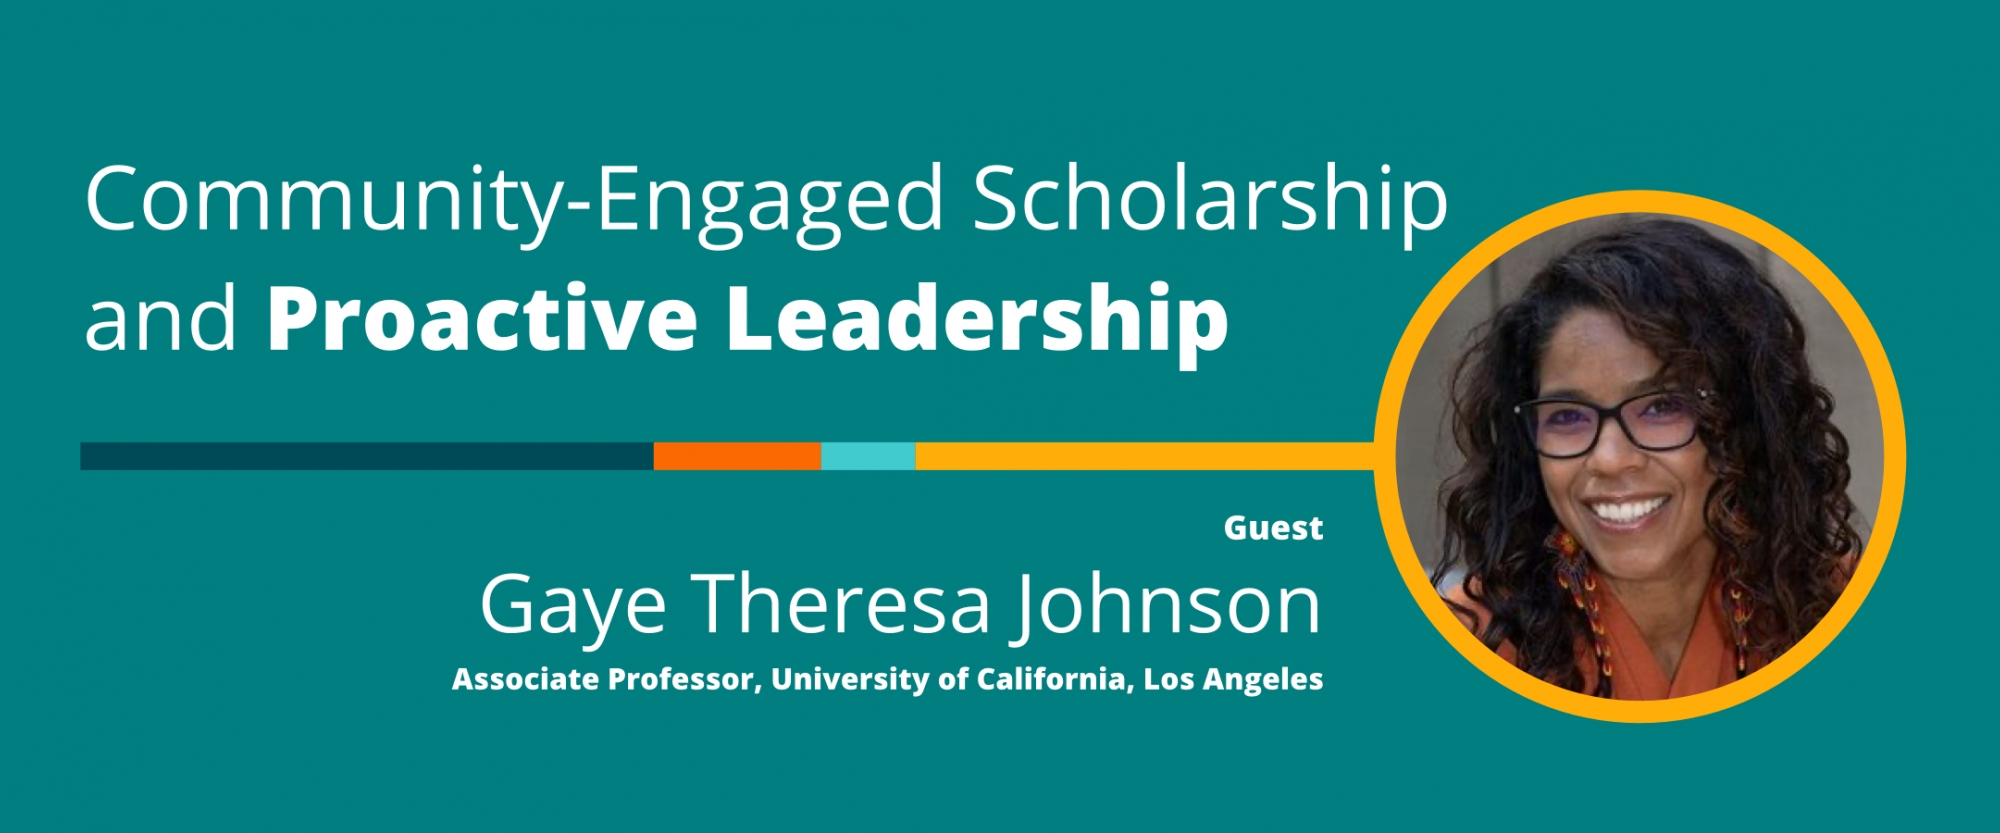 Community-Engaged Scholarship and Proactive Leadership